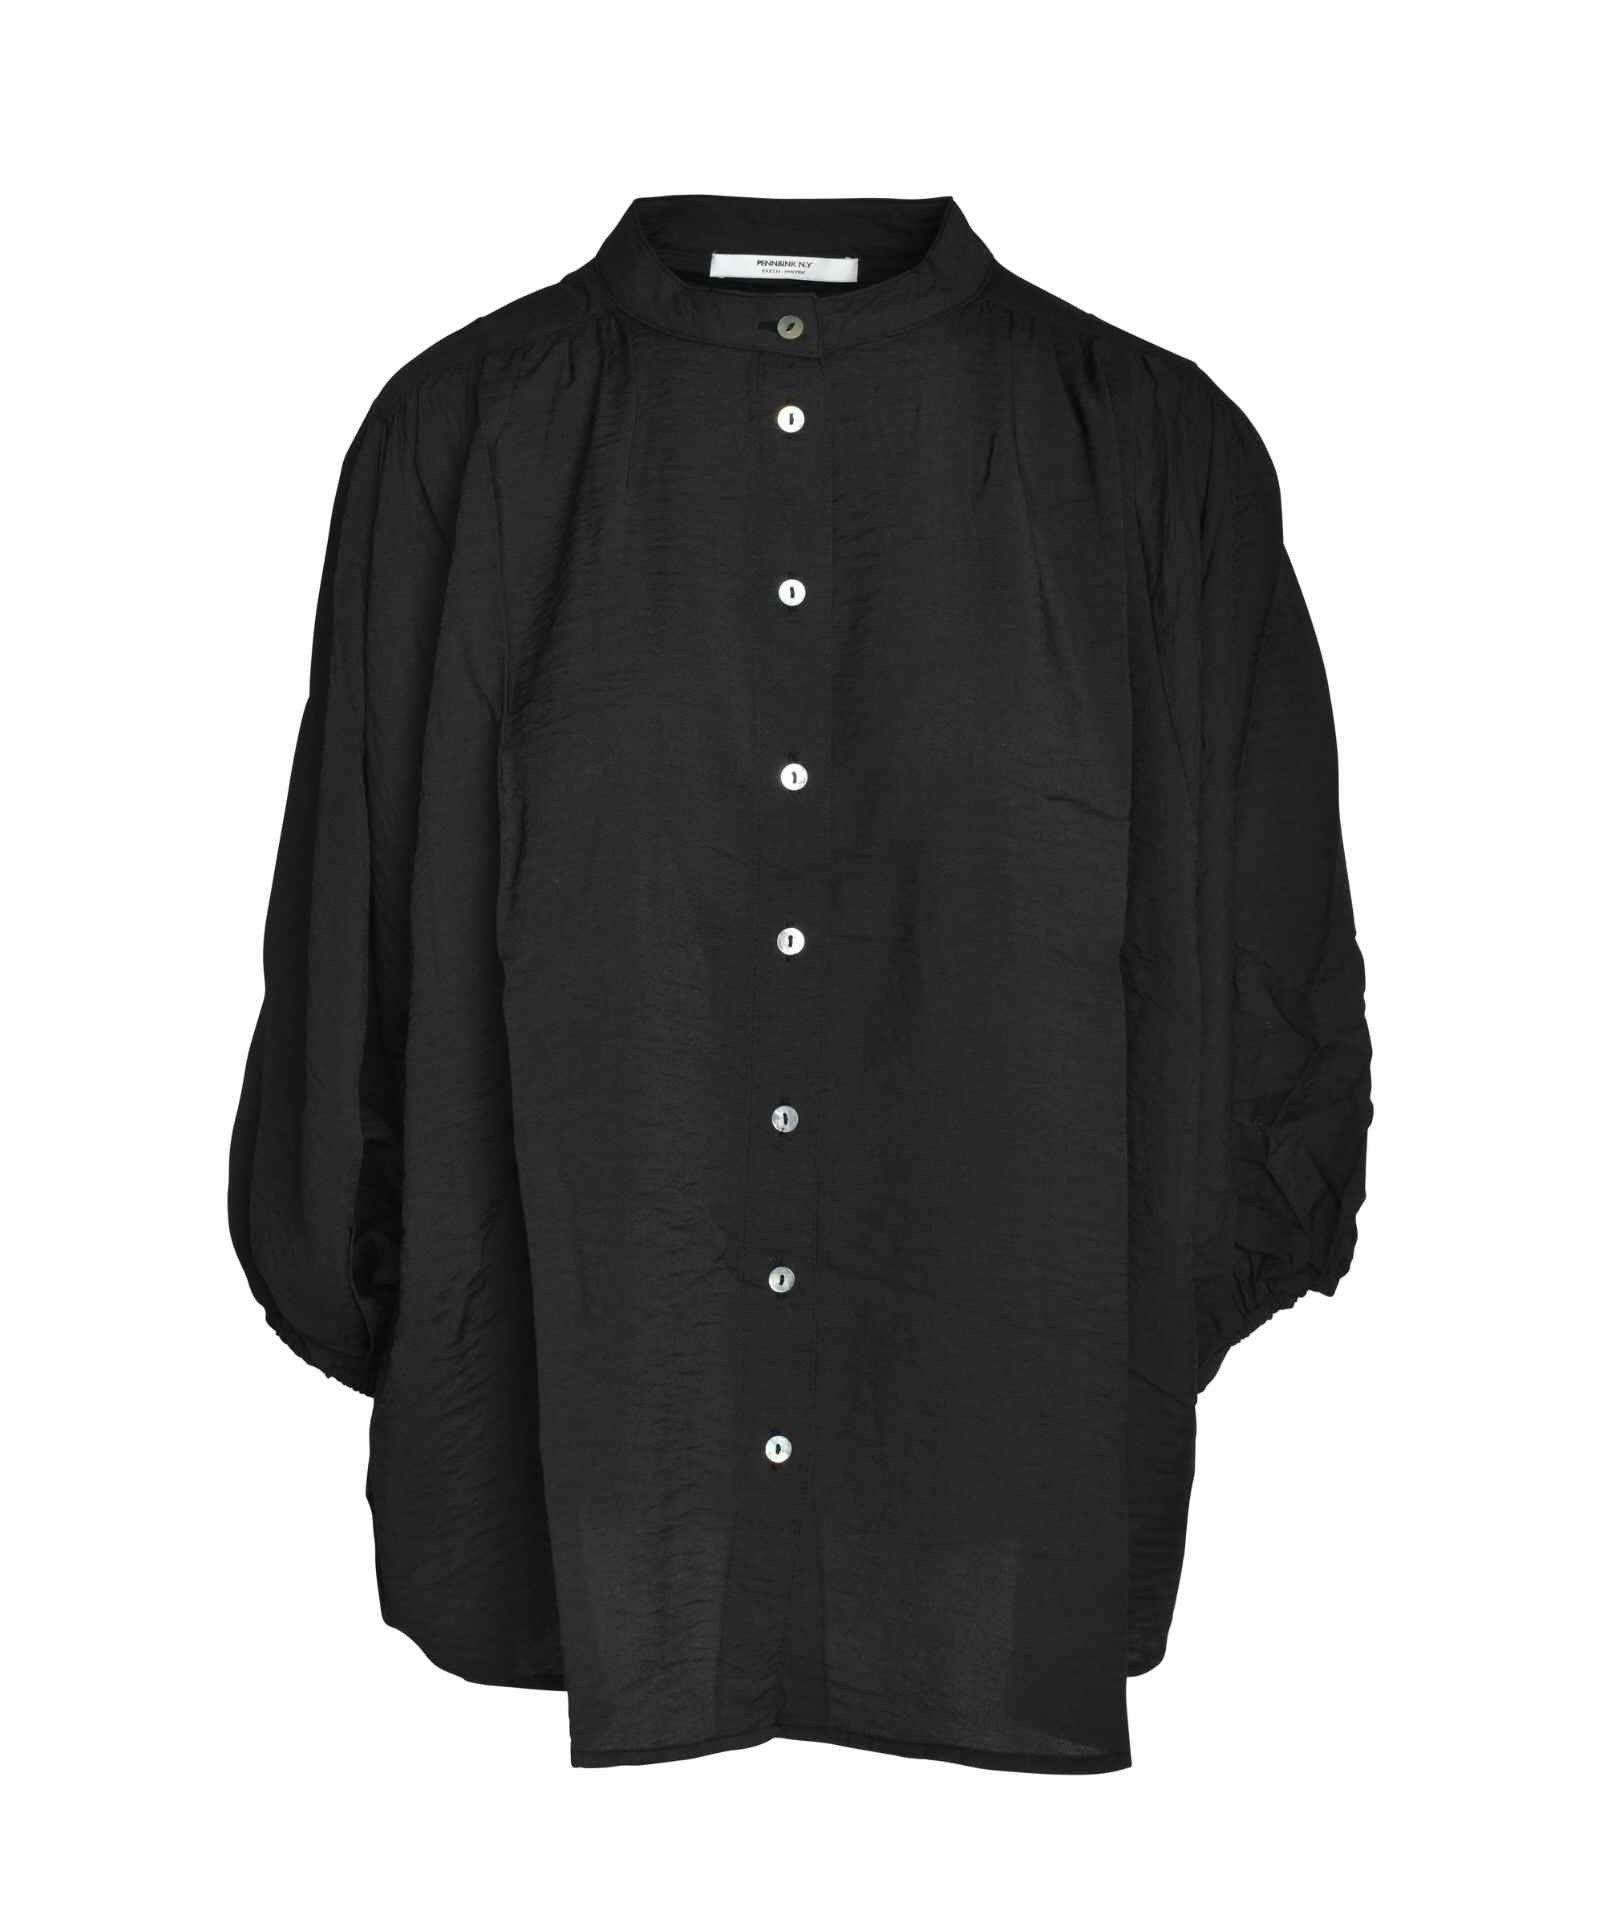 PENN&INK N.Y - Damen Bluse - Black